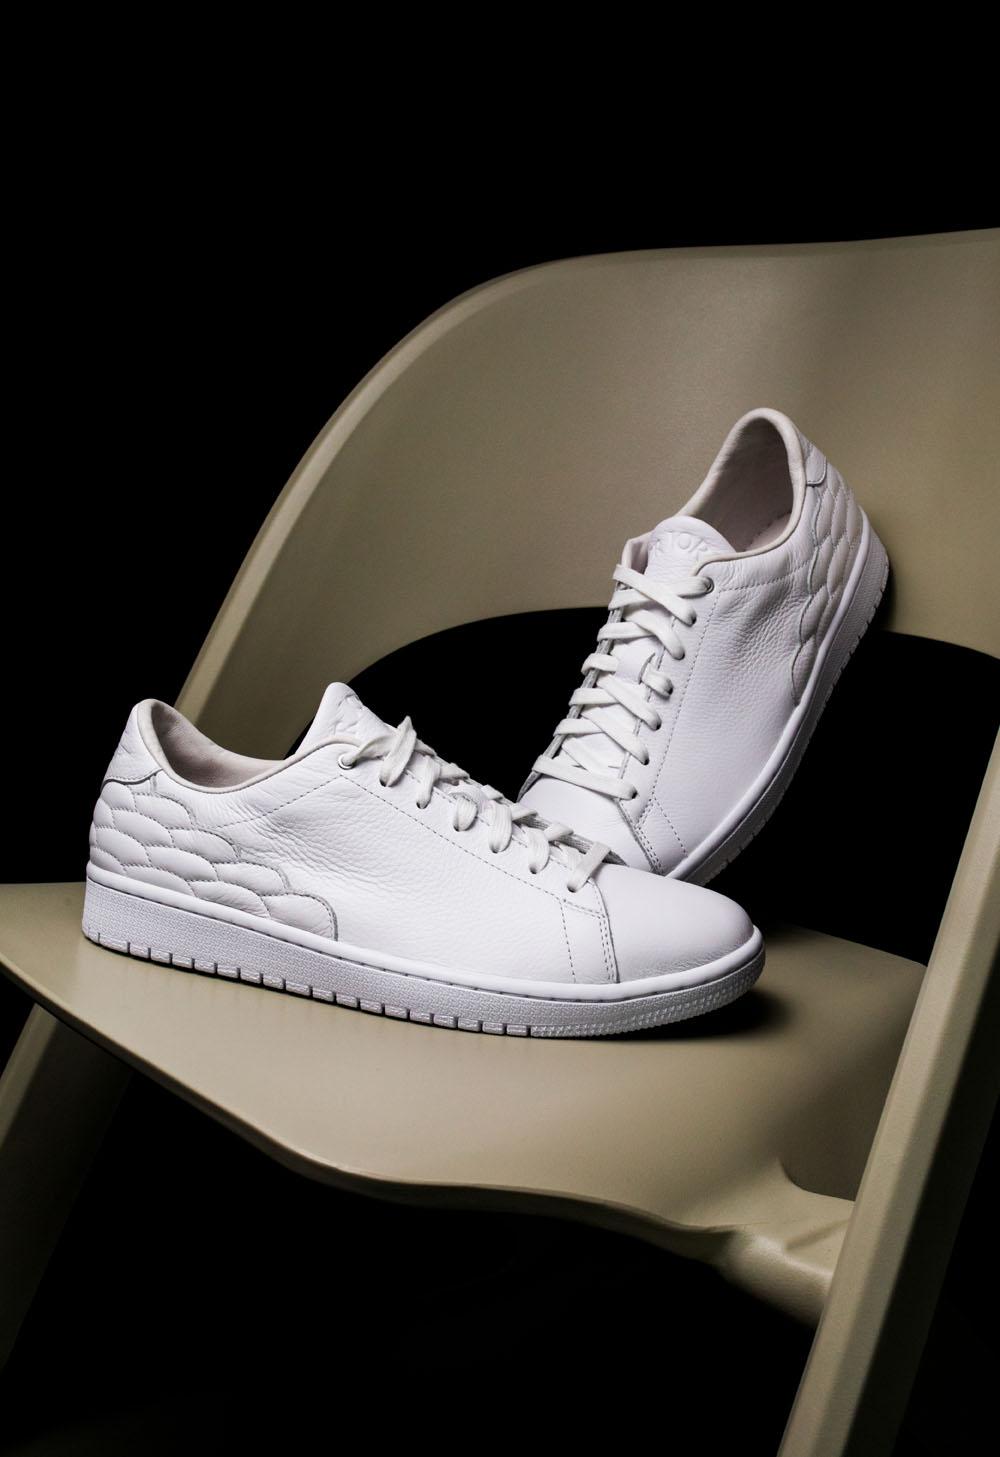 Air Jordan 1,Centre Court  冠希抢着晒!Air Jordan 1 小白鞋现已开启登记!